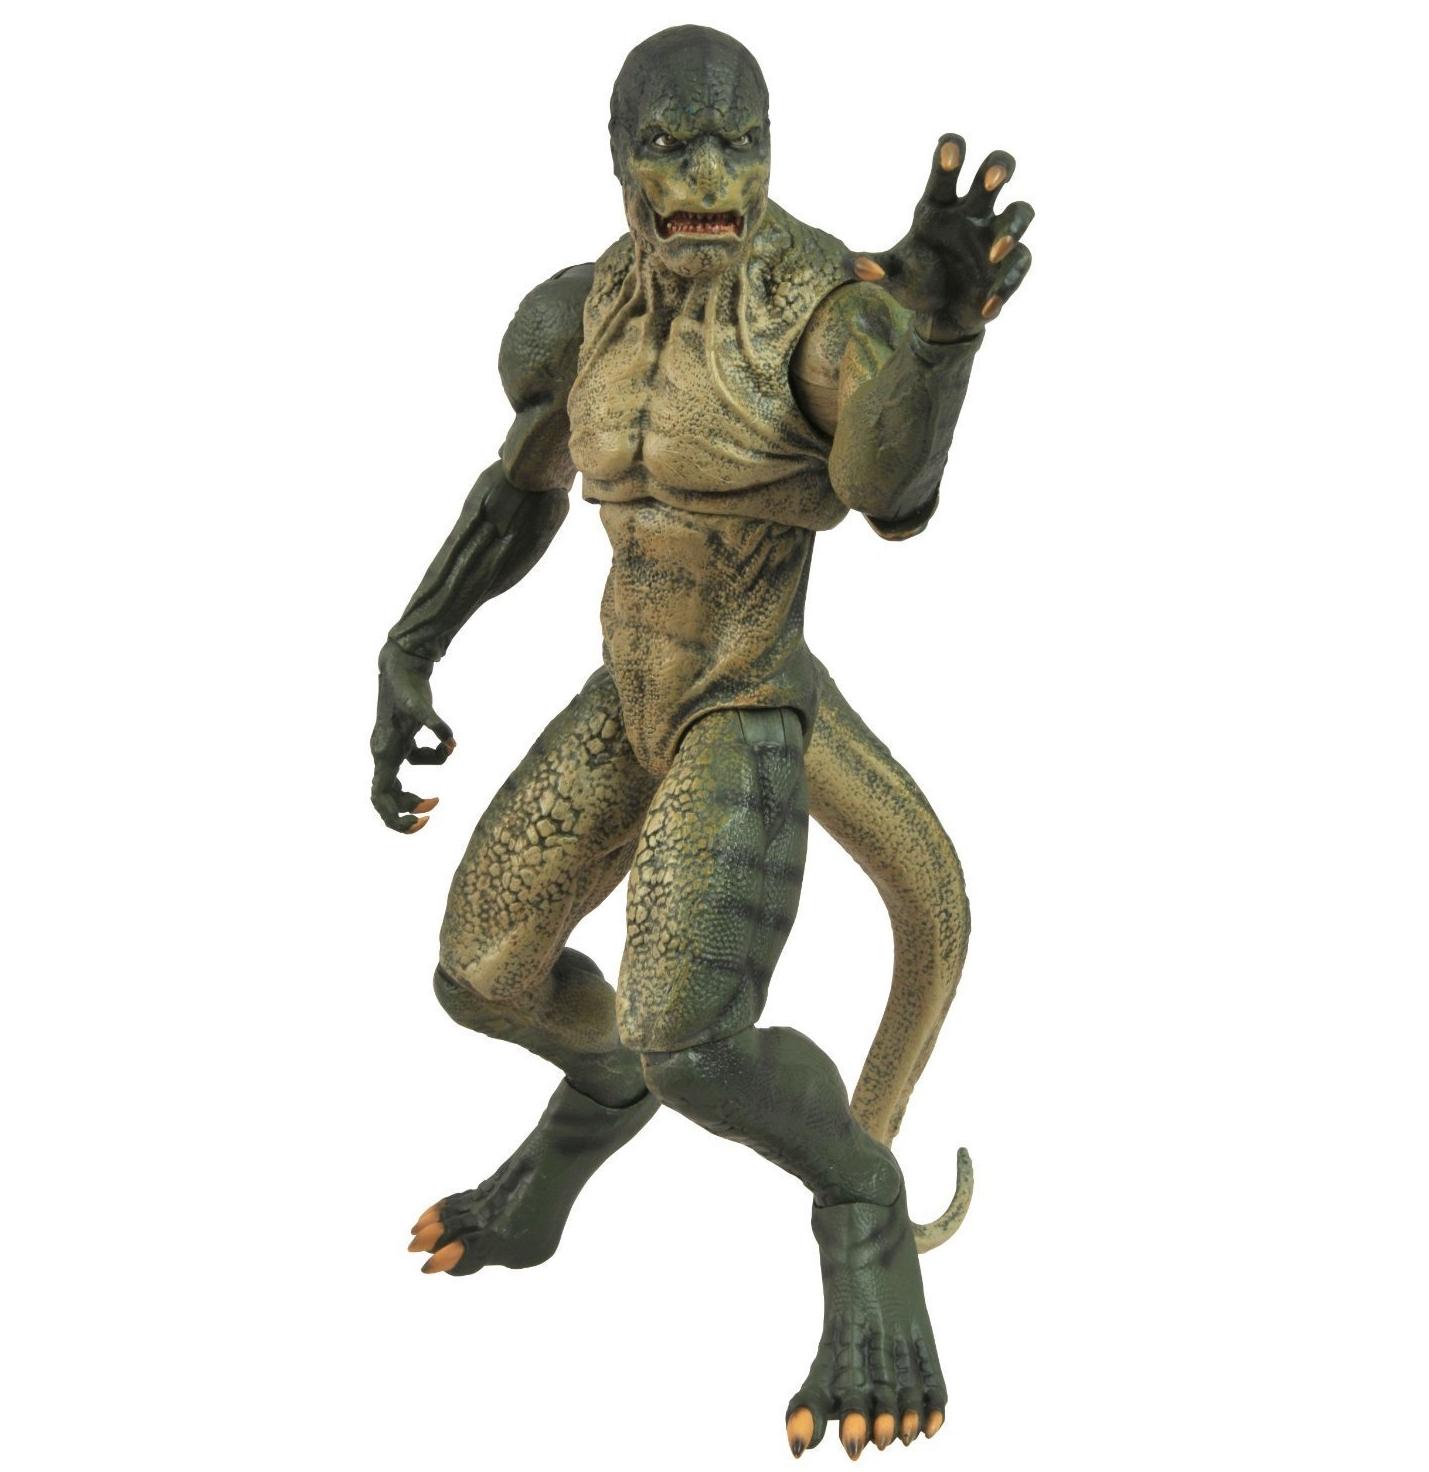 the amazing spider man lizard figurine articul e. Black Bedroom Furniture Sets. Home Design Ideas